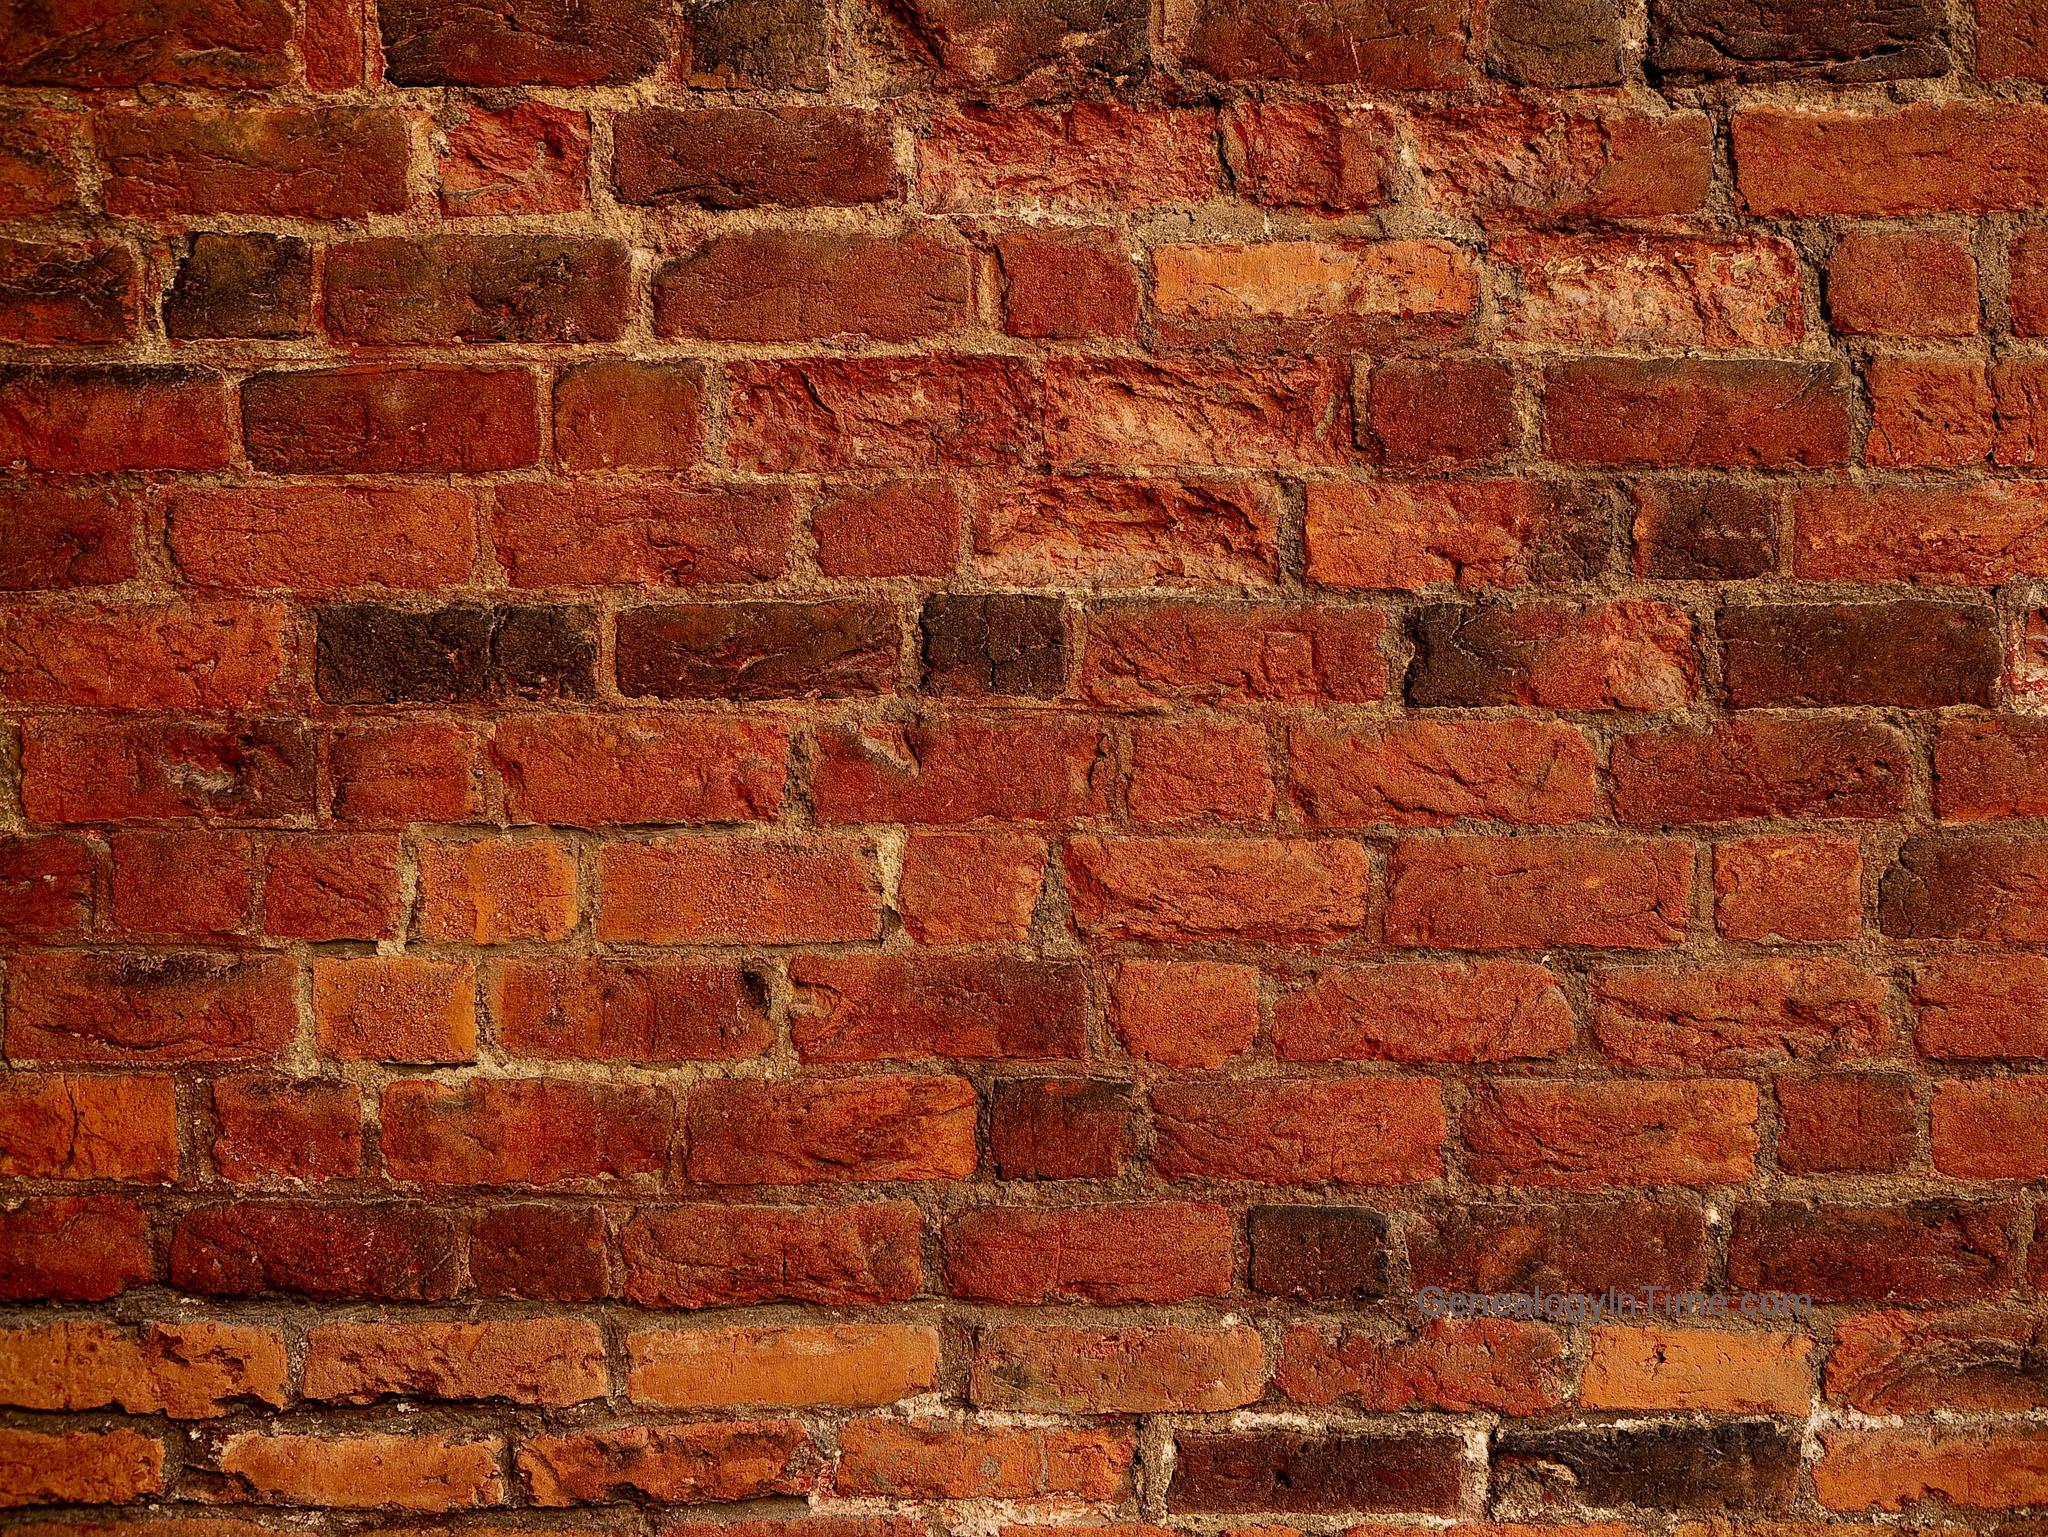 Image 02   1740 Swedish Brick Wall 2048x1537